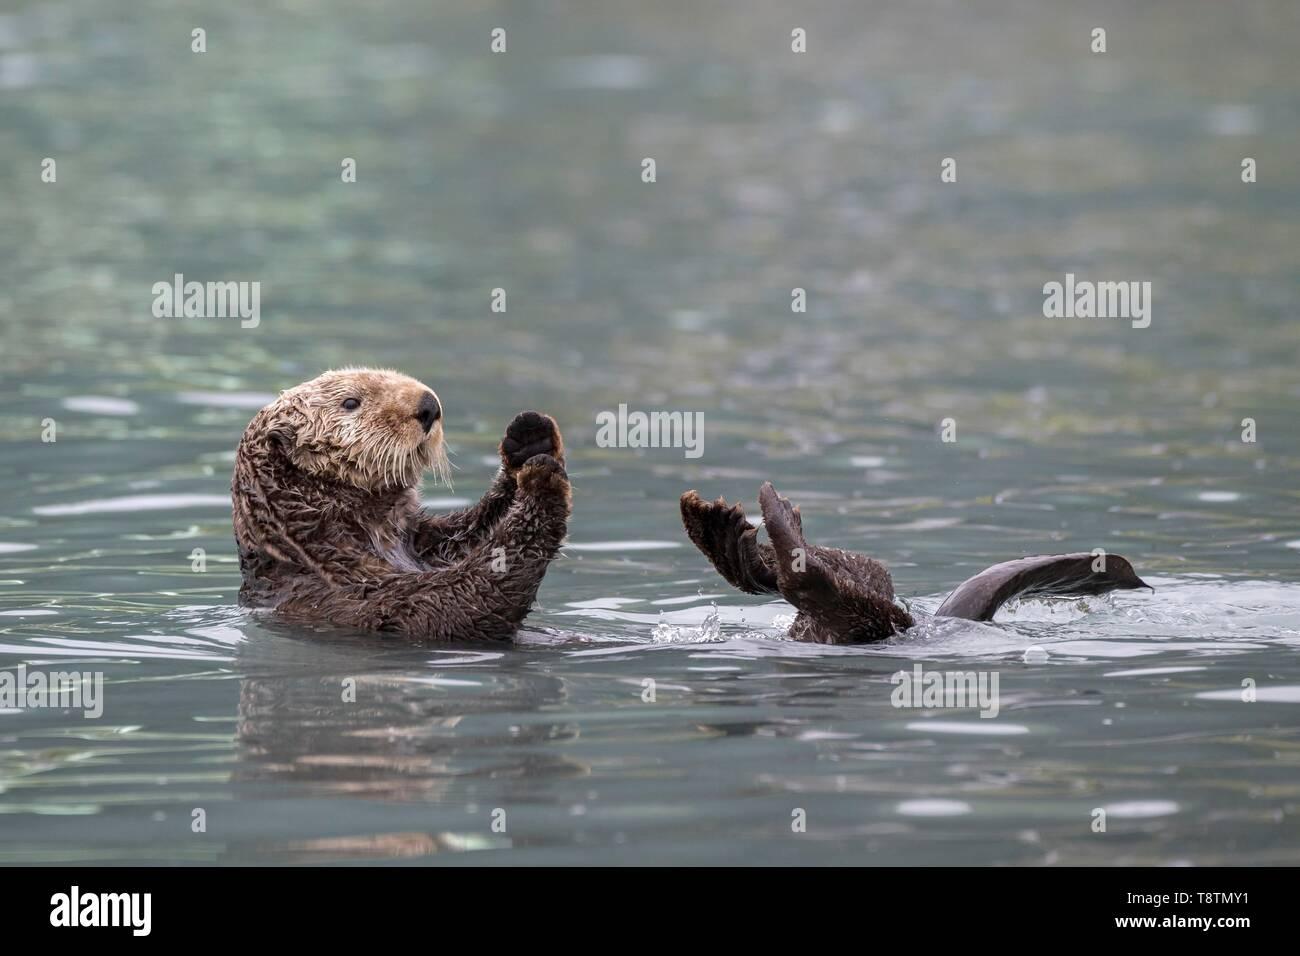 Sea otter (Enhydra lutris) floats on back, Seward, Alaska